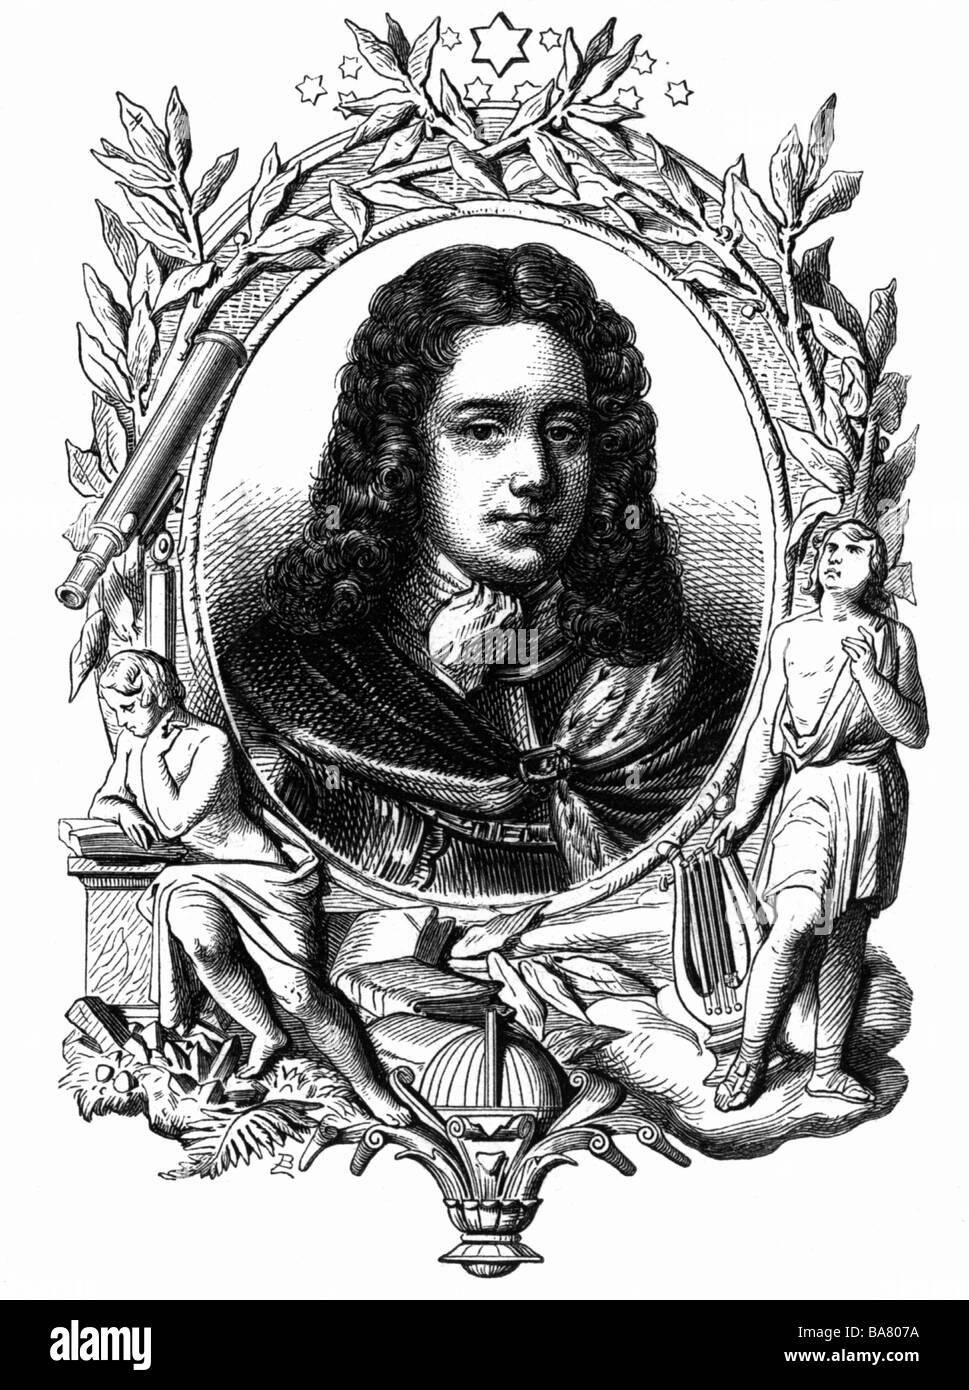 Rouvroy, Louis de, Herzog von Saint-Simon, 16.1.1675 - 2.3.1755, French politician, author / writer, portrait, wood - Stock Image